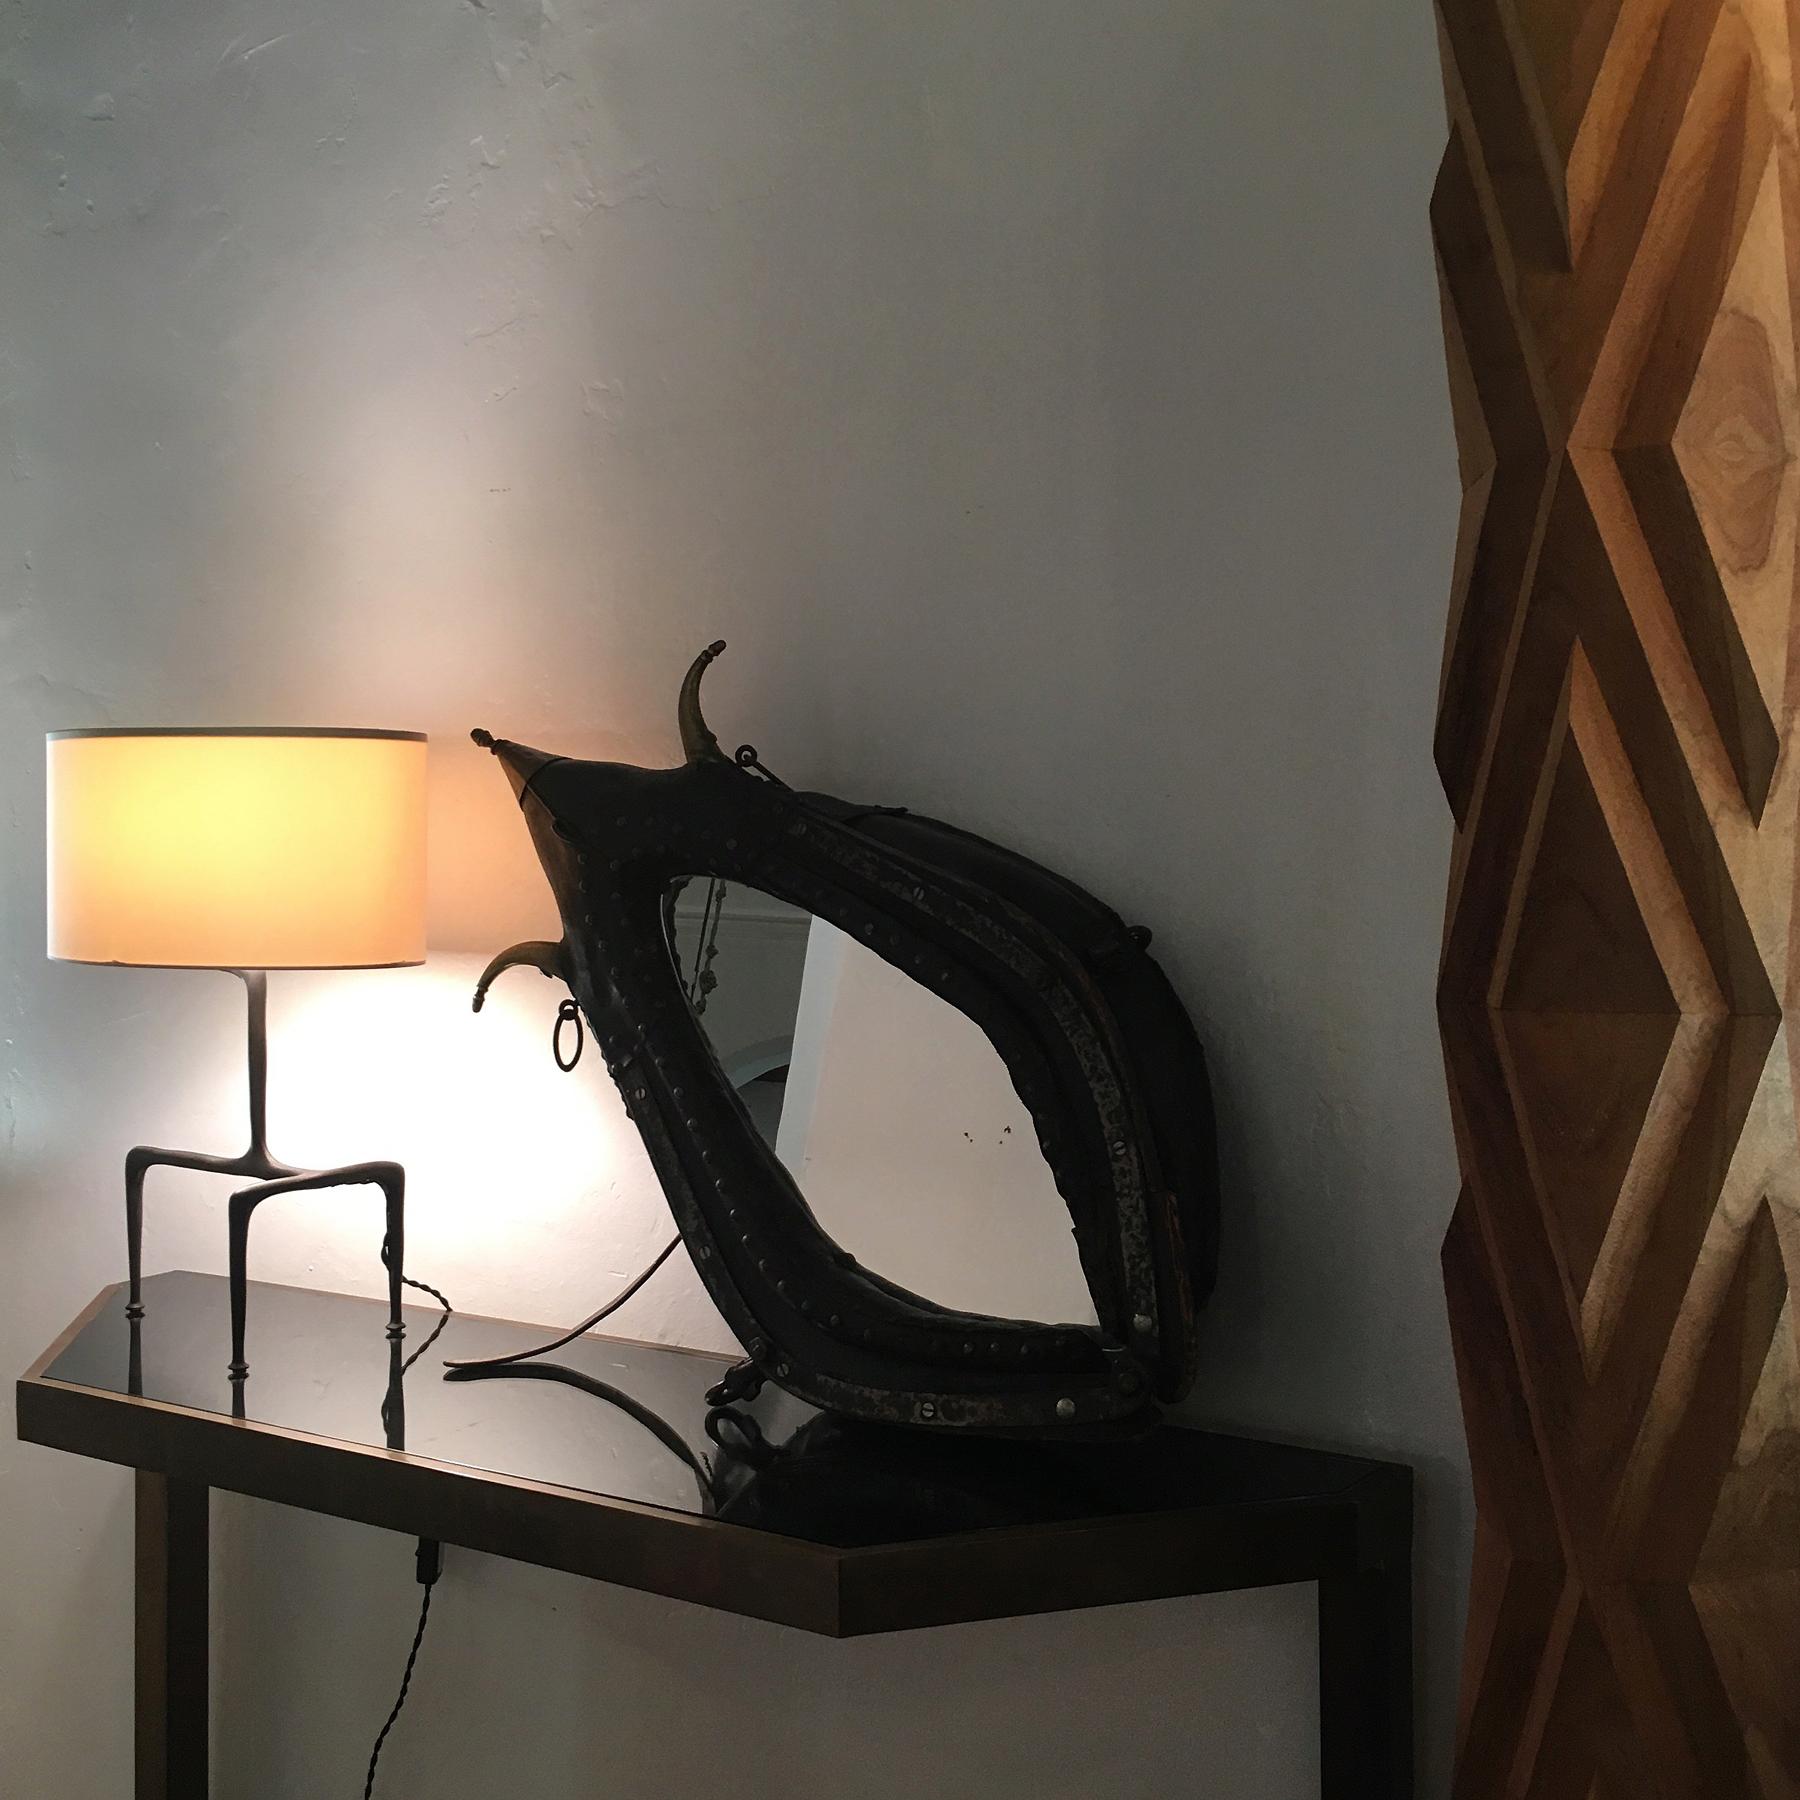 siglo-moderno-brand-history-sculpting-8.jpg